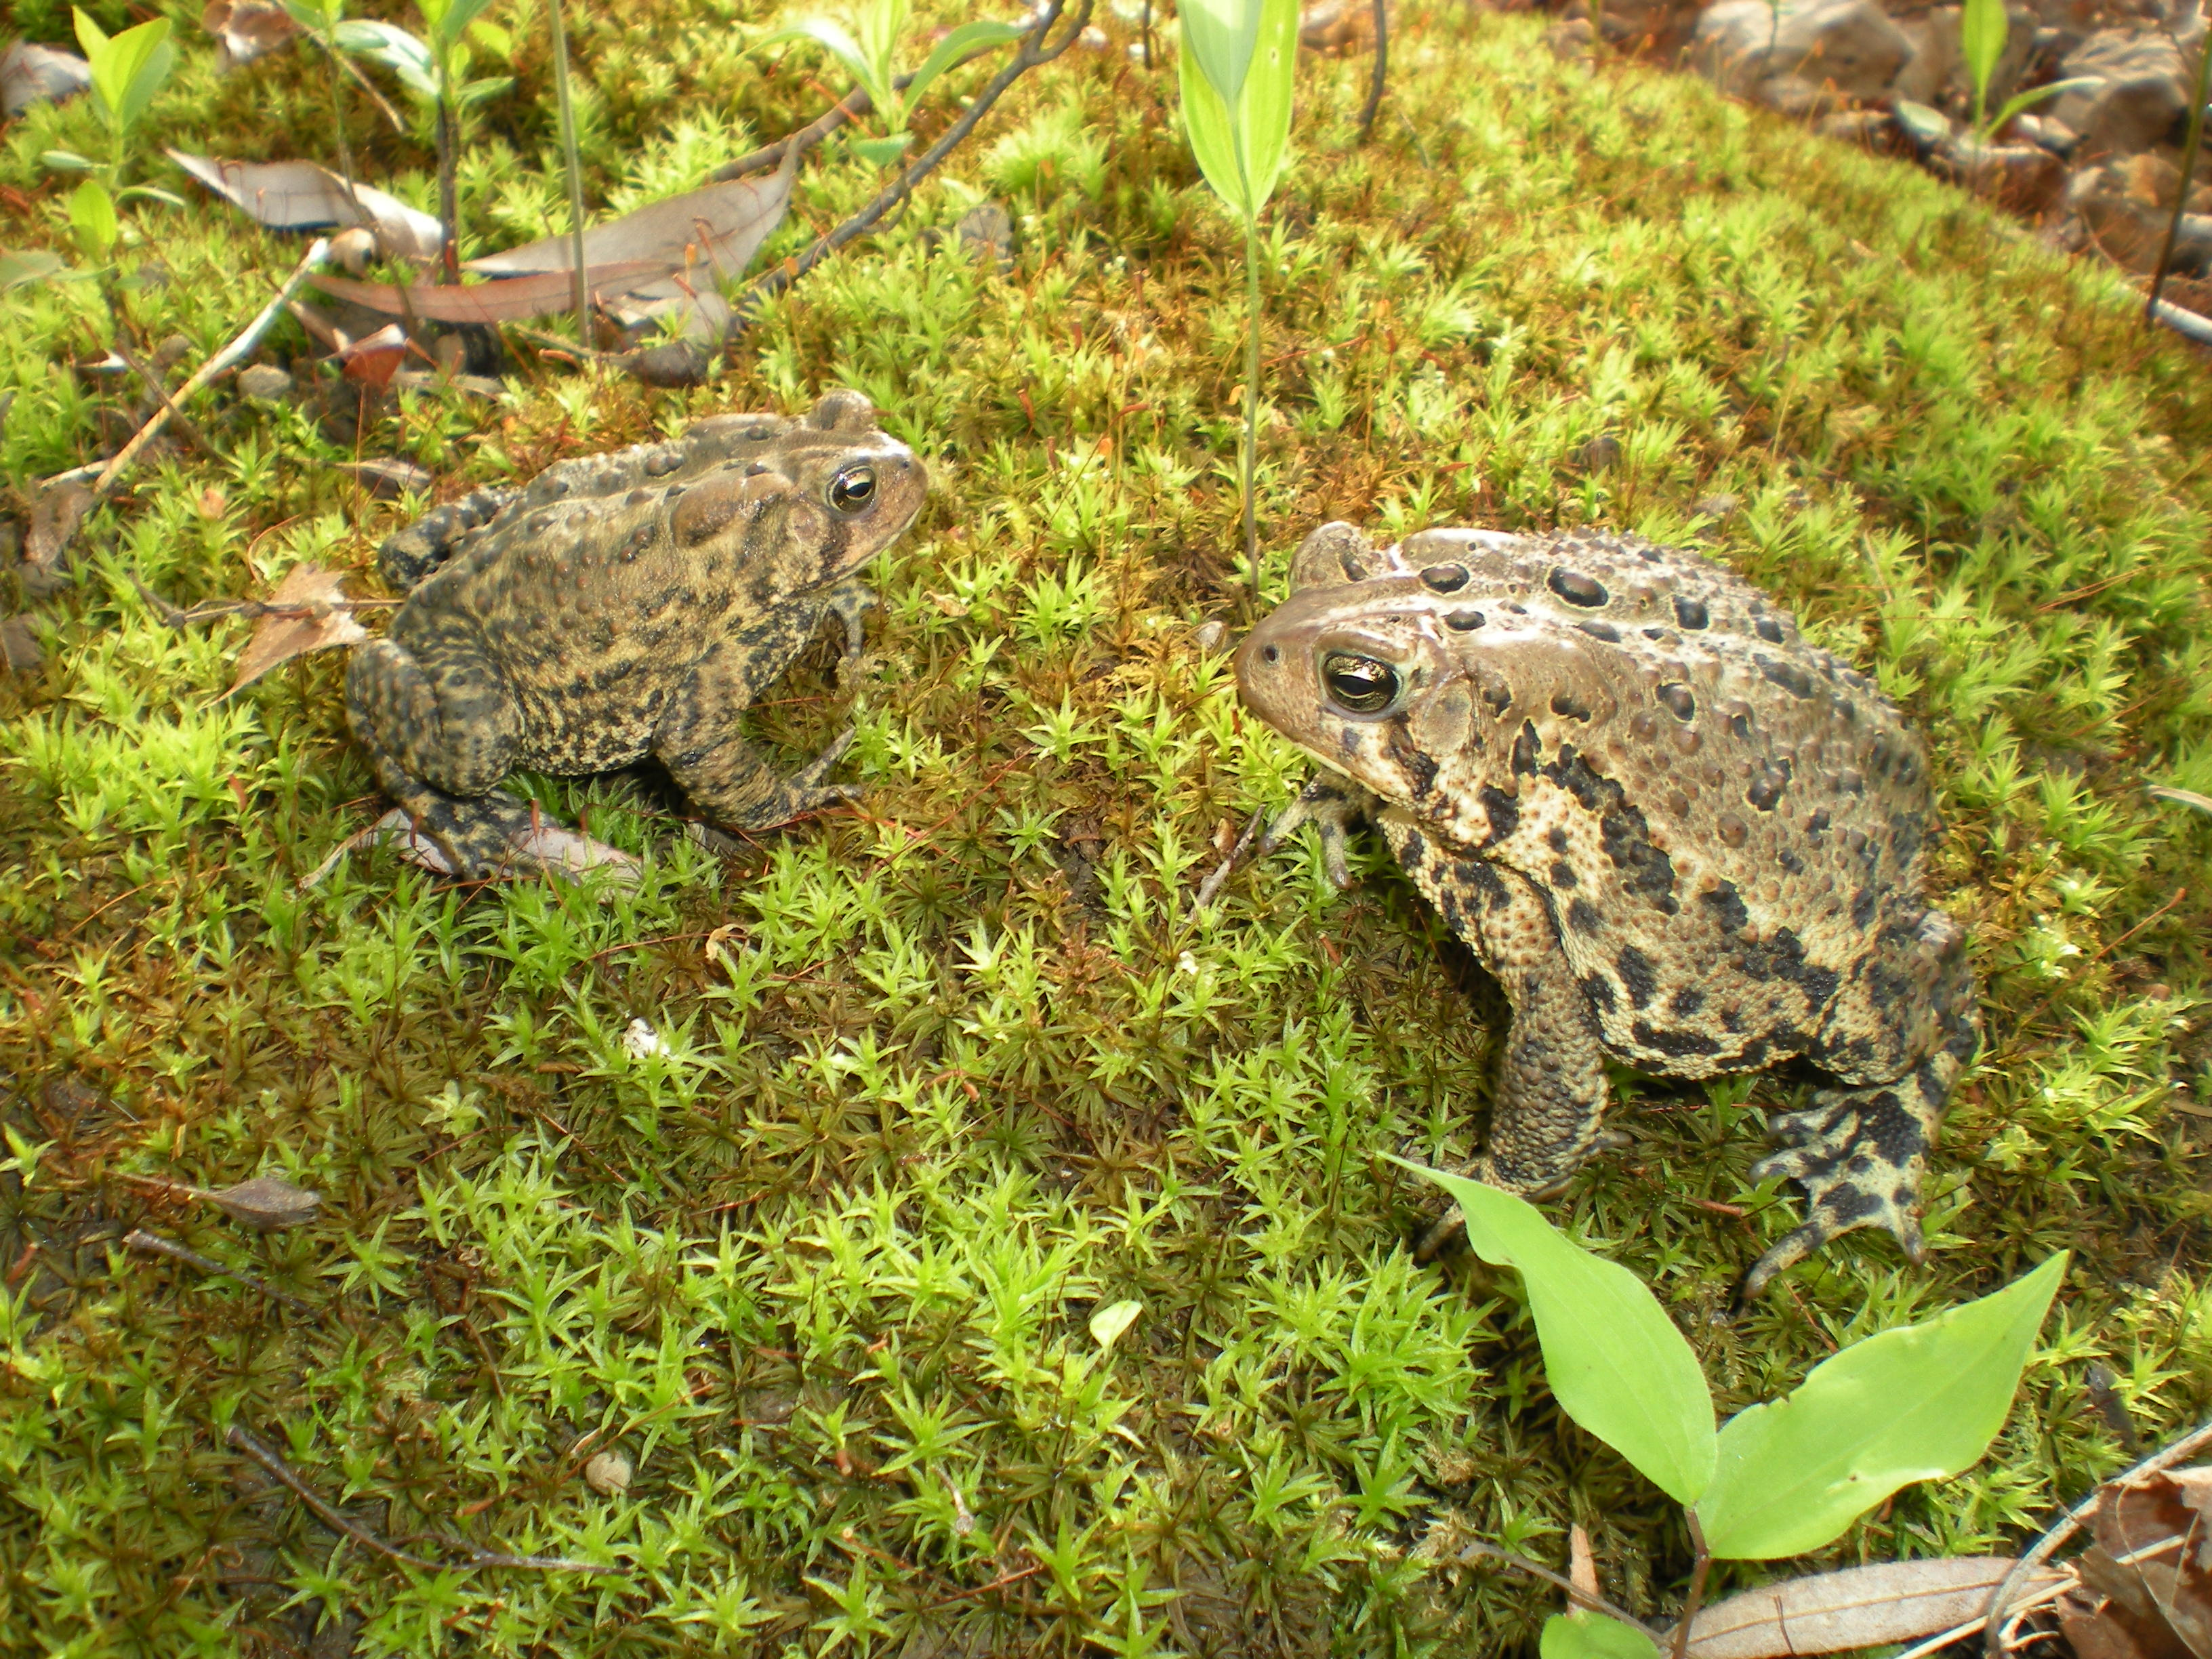 American toads, Greenquist Woods, UW-Parkside, Kenosha, WI.